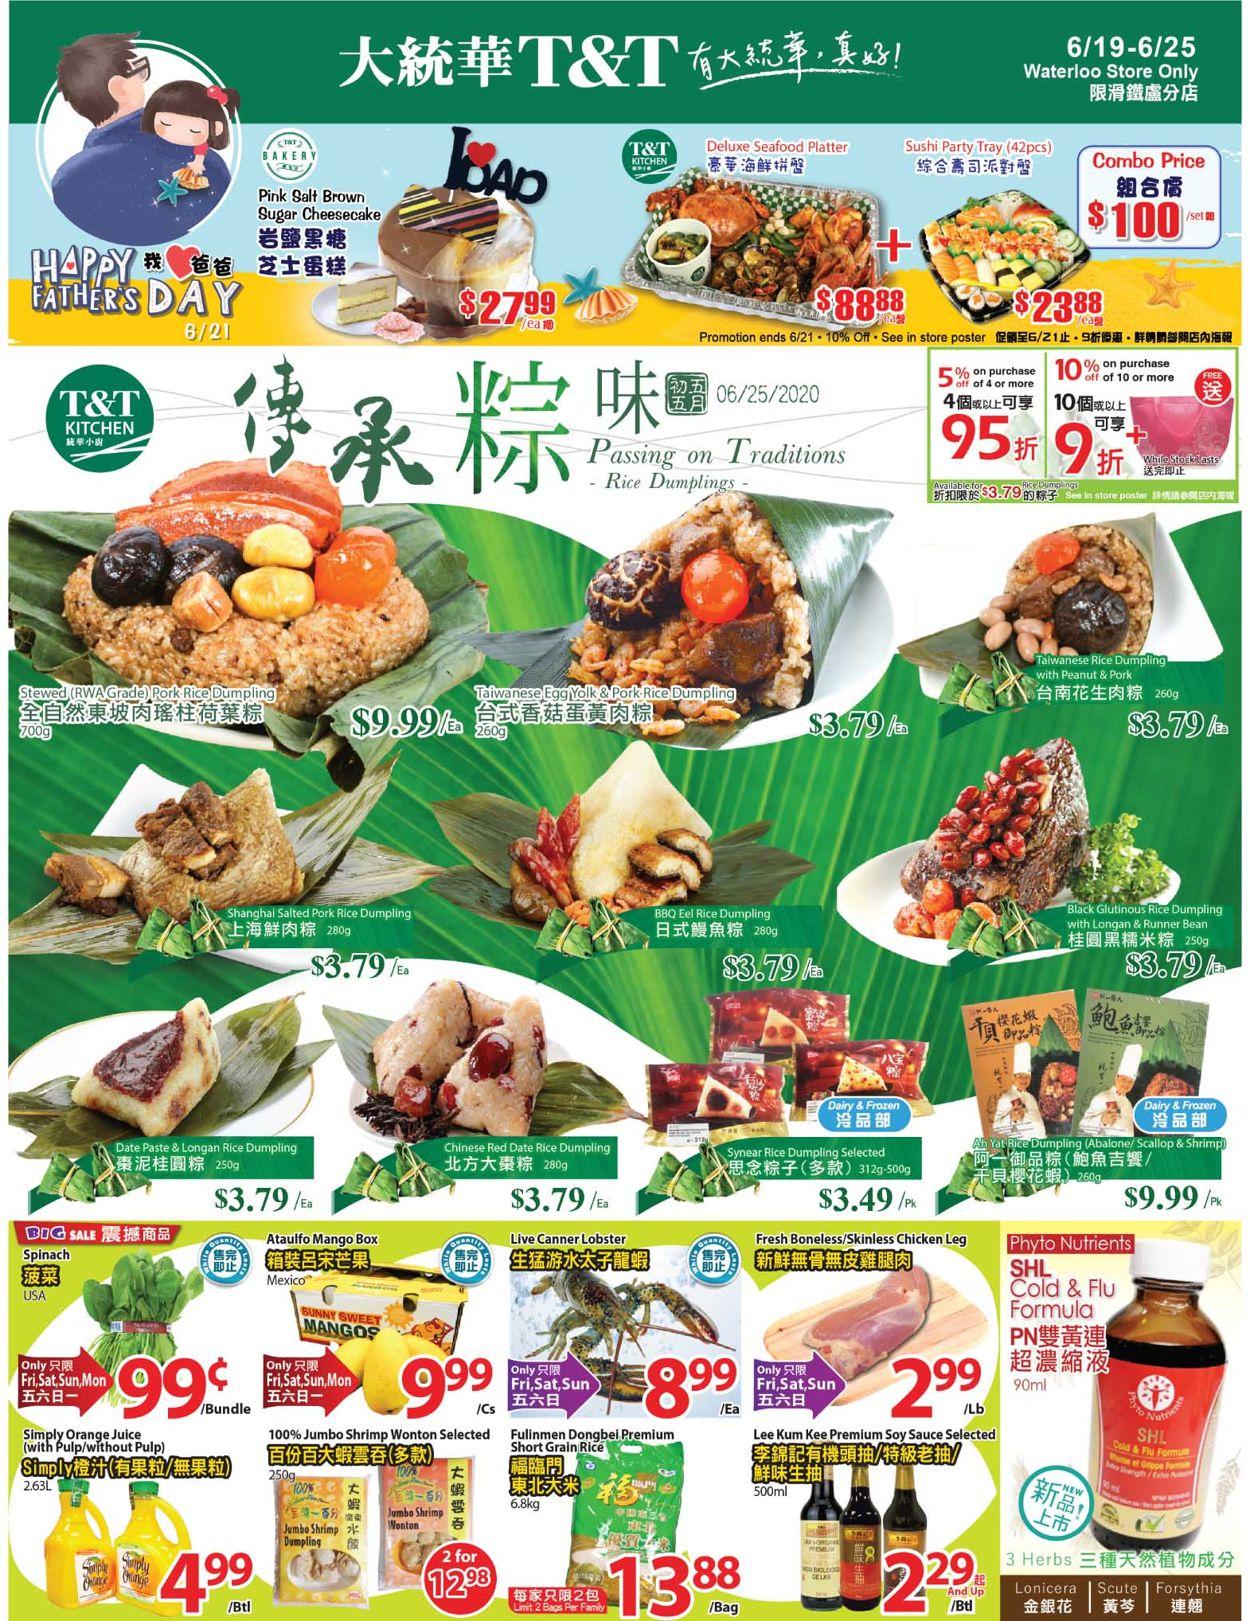 T&T Supermarket Flyer - 06/19-06/25/2020